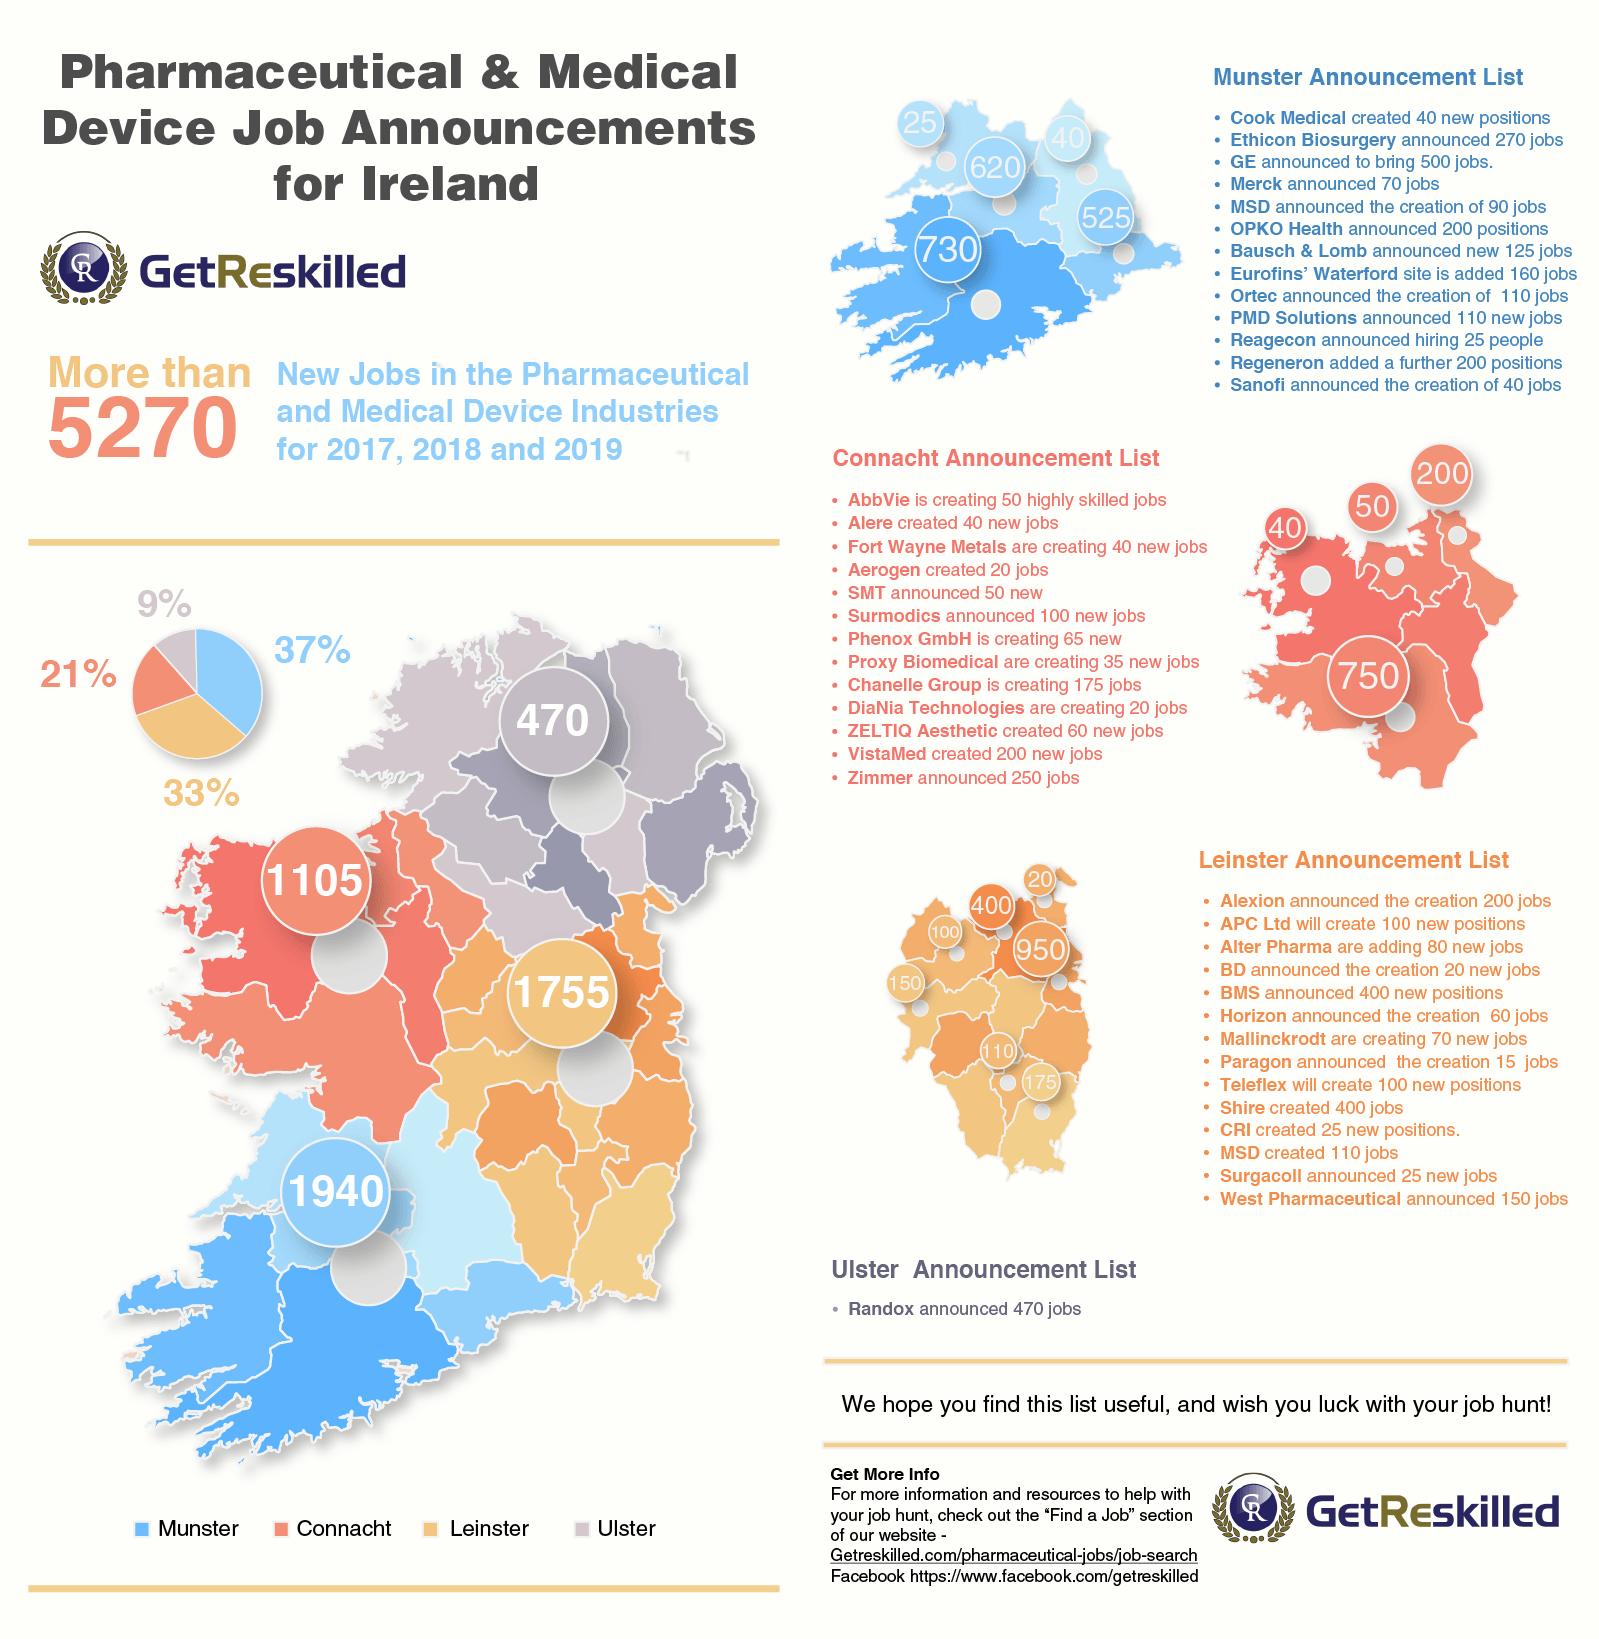 Pharma Job Announcements for Ireland